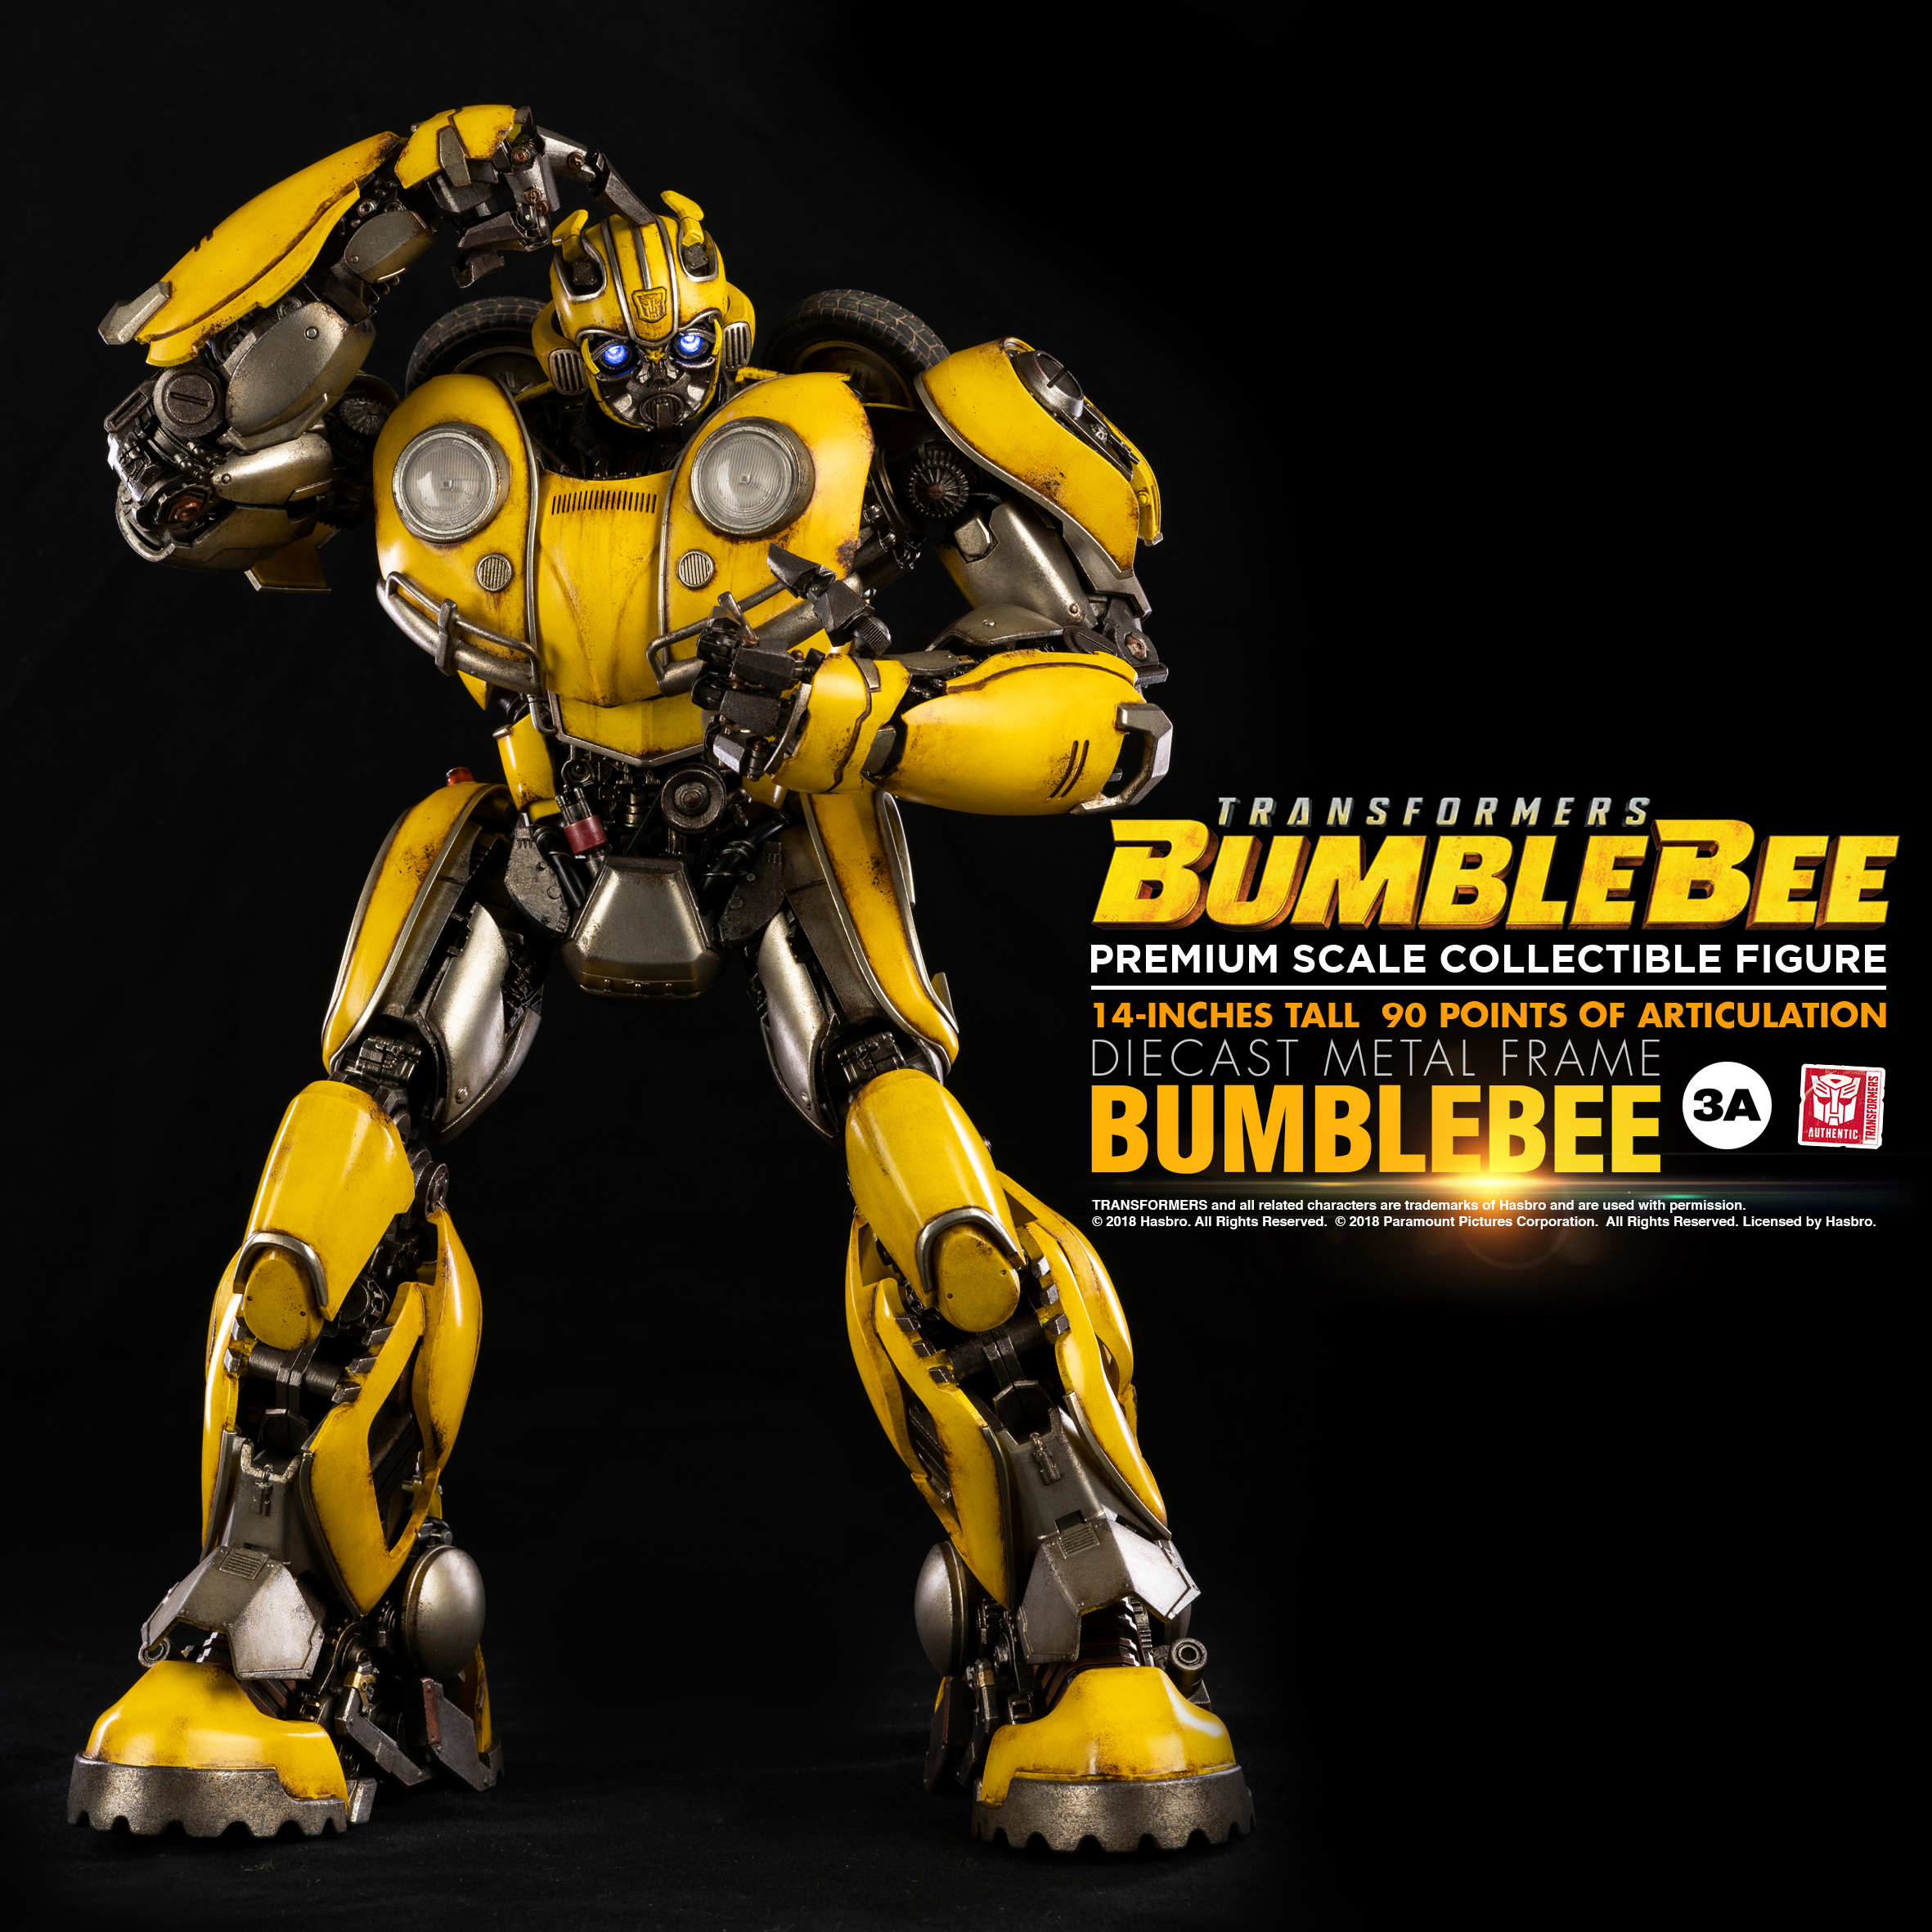 Bumblebee_ENG_PM_SQUARE_003.jpg